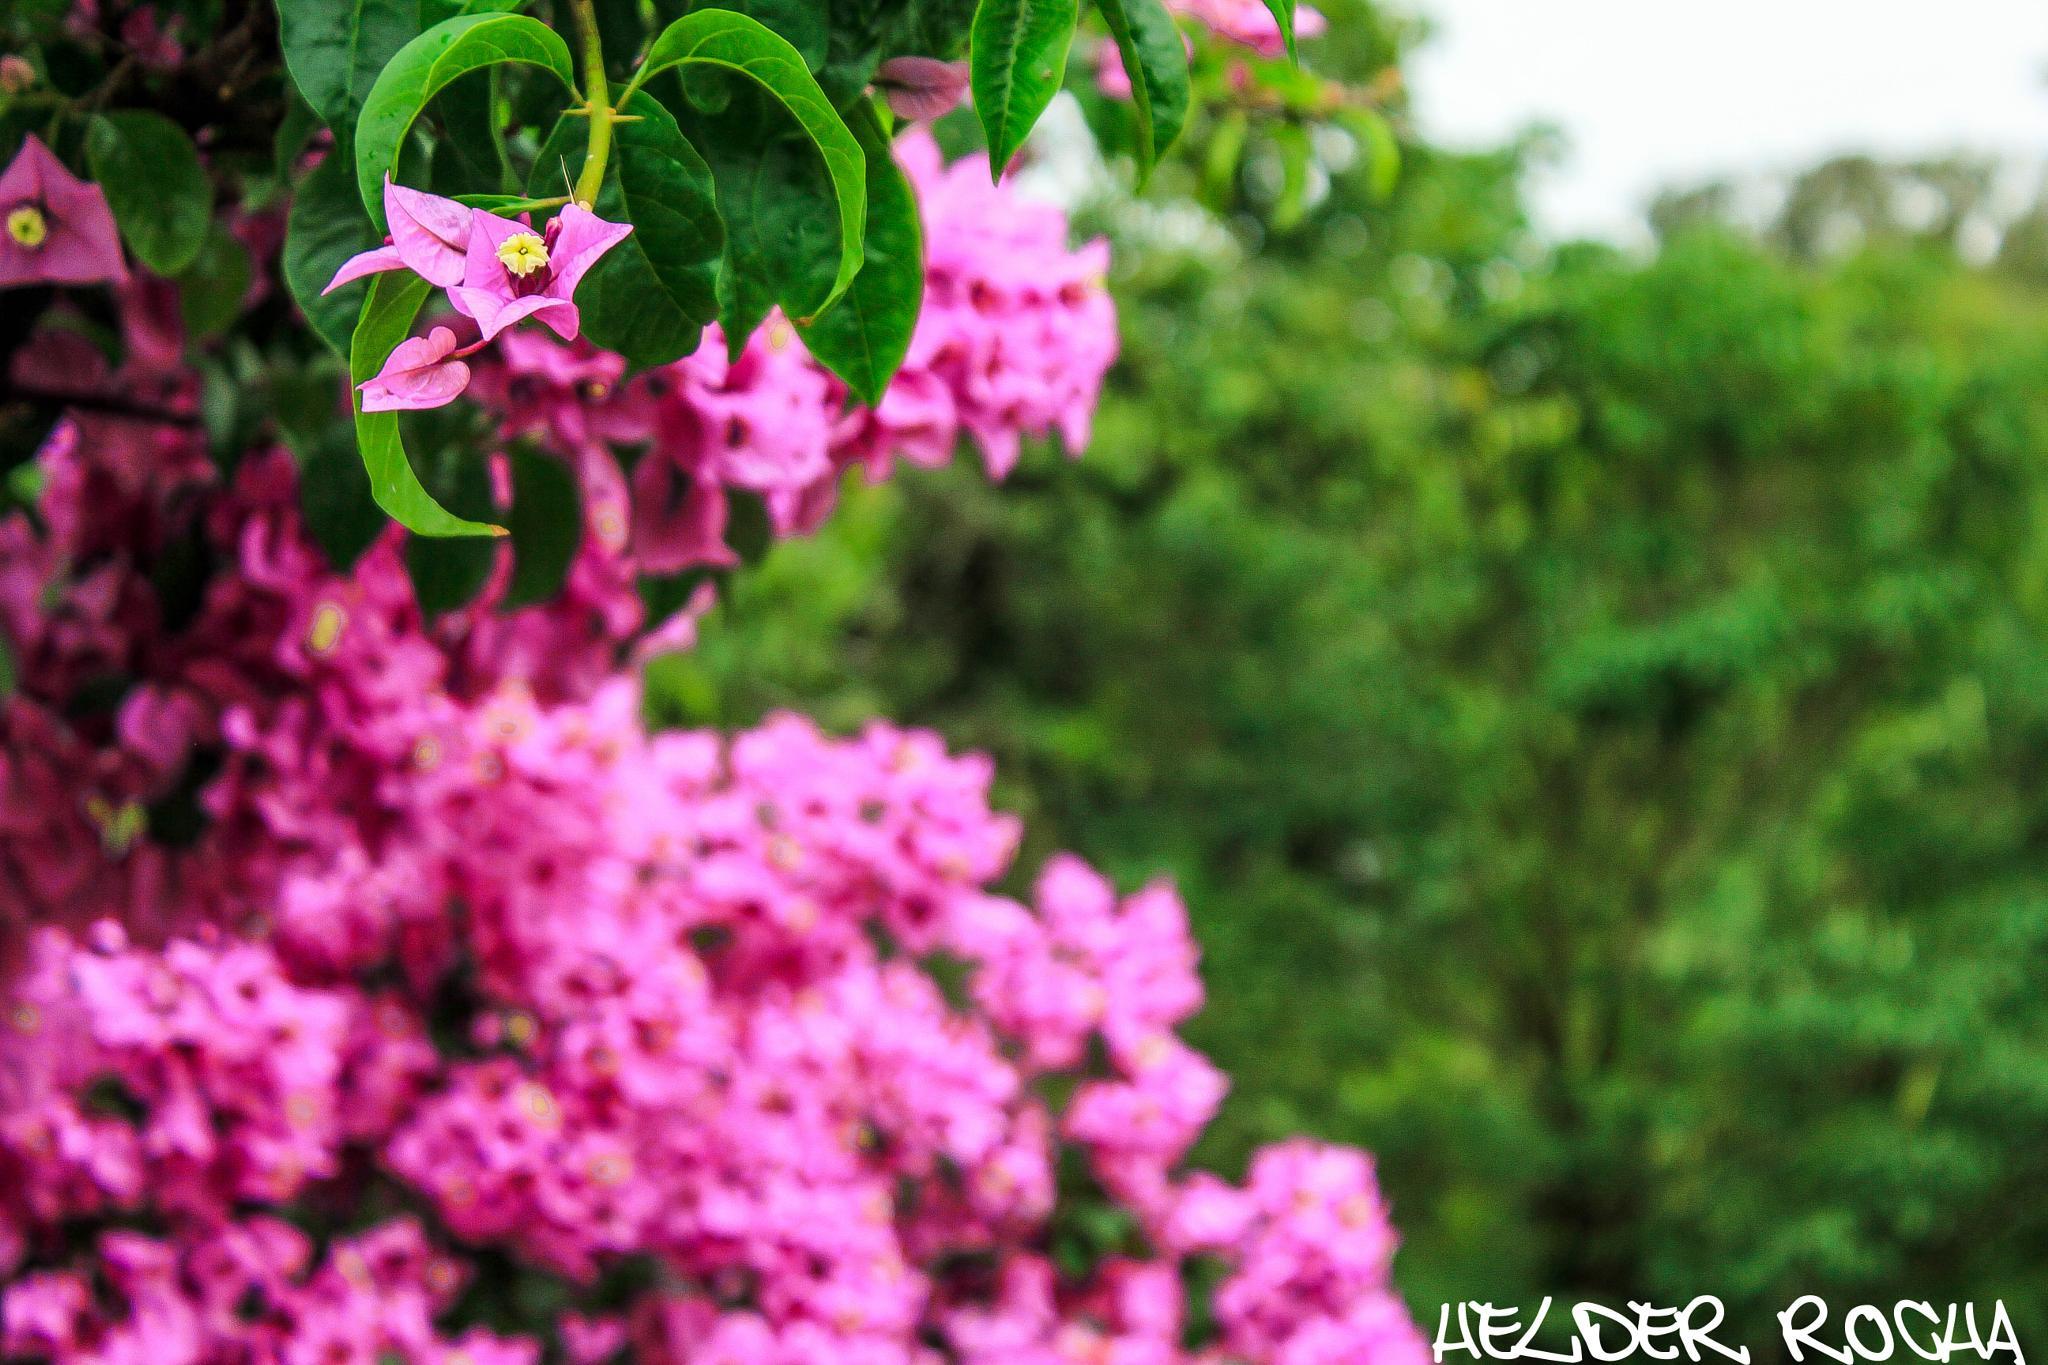 Flowers in the Babylon - Pt. 2 by HelderRocha